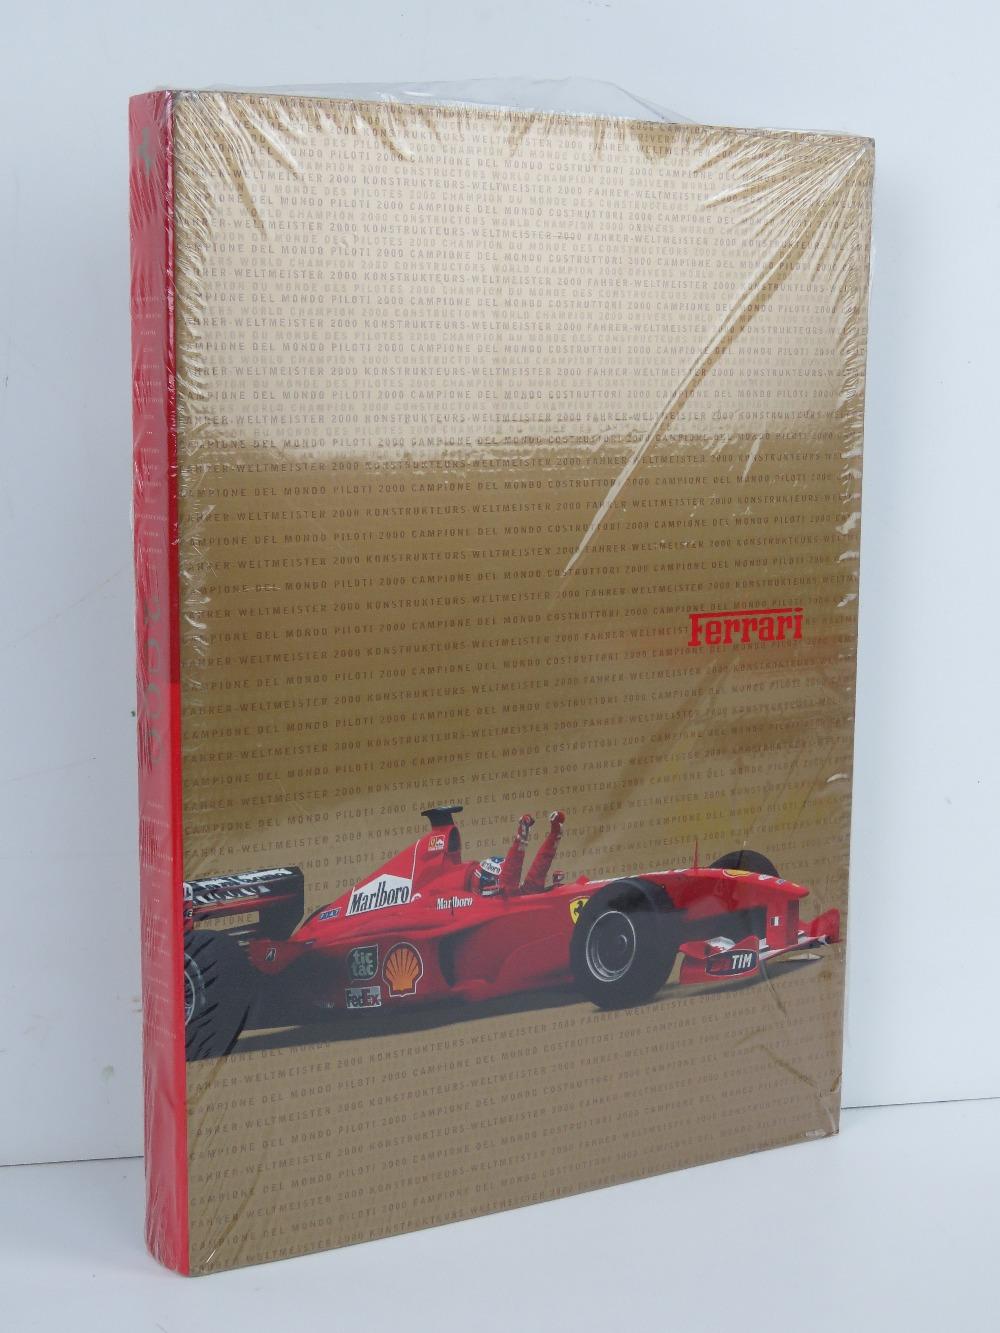 Ferrari Yearbook 2000. English / Italian edition. Softback book.